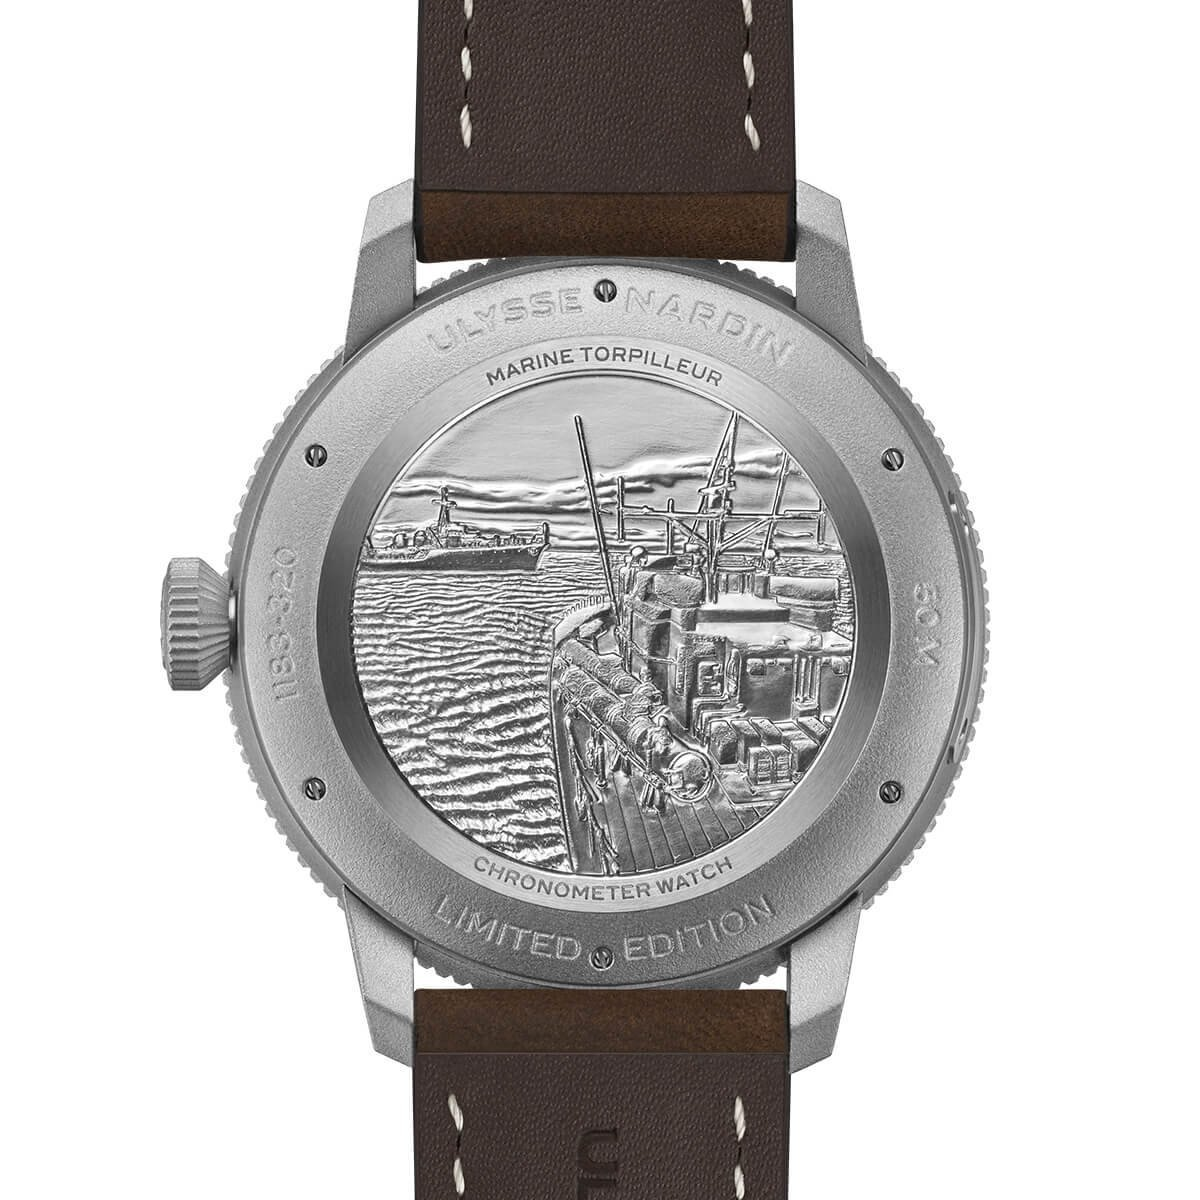 Montre Ulysse Nardin Marine Torpilleur 44mm vue 3